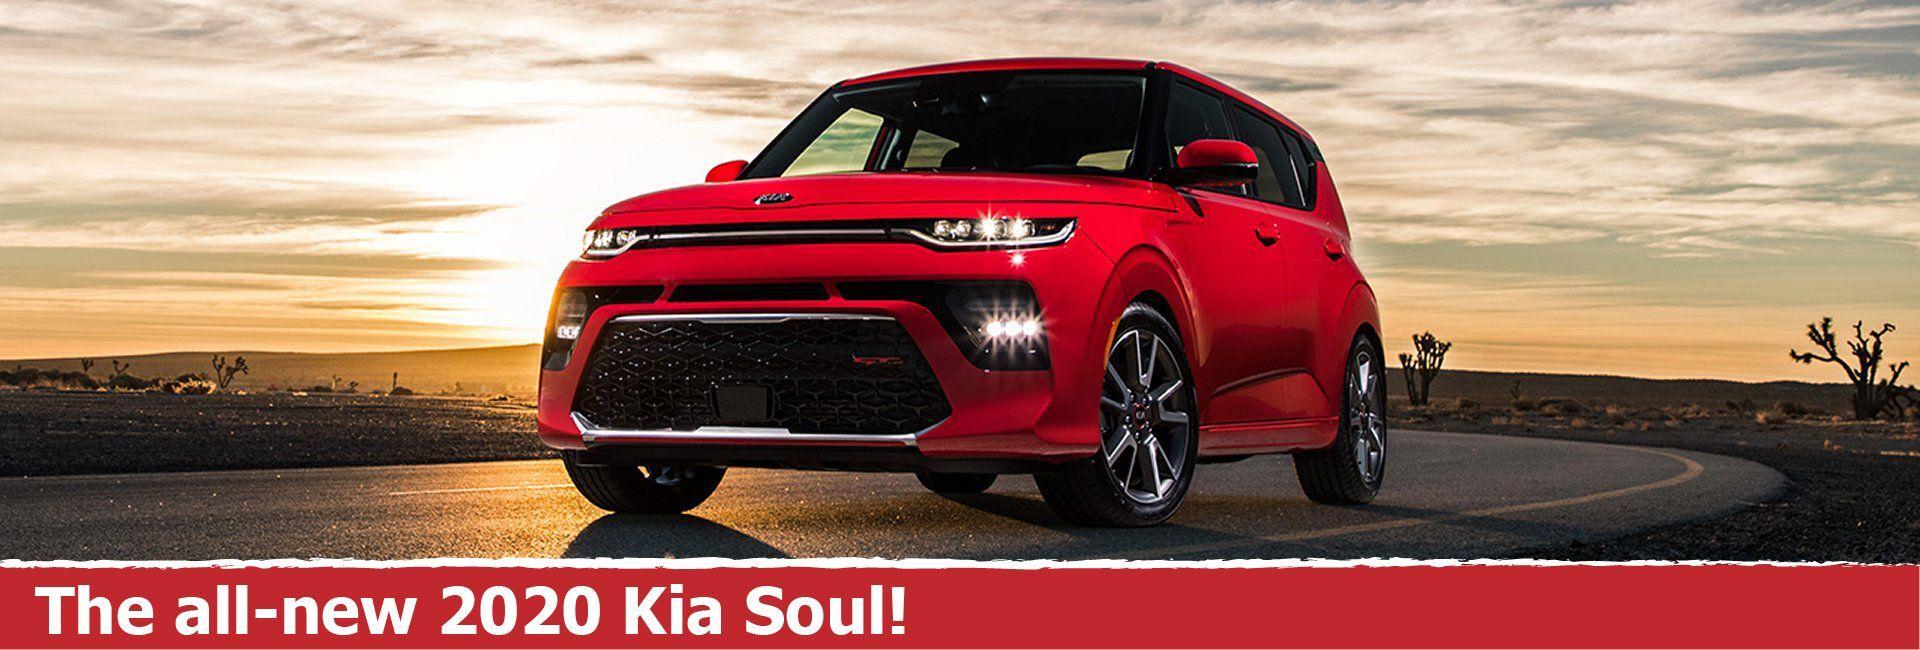 The all-new 2020 Kia Soul